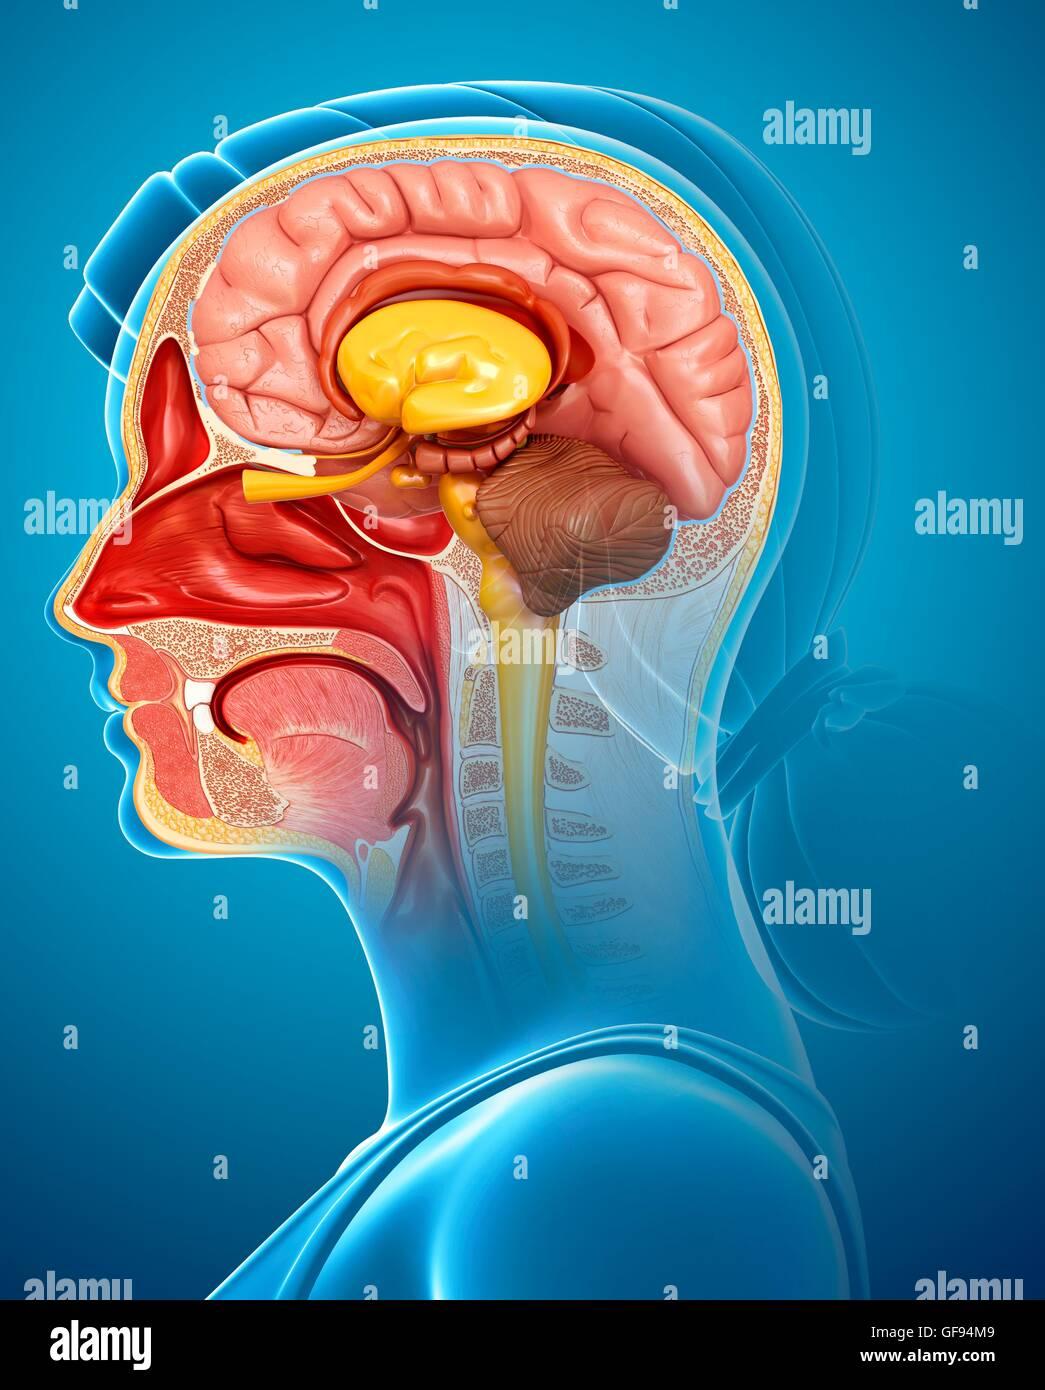 Illustration of brain anatomy with nasal cavity Stock Photo ...